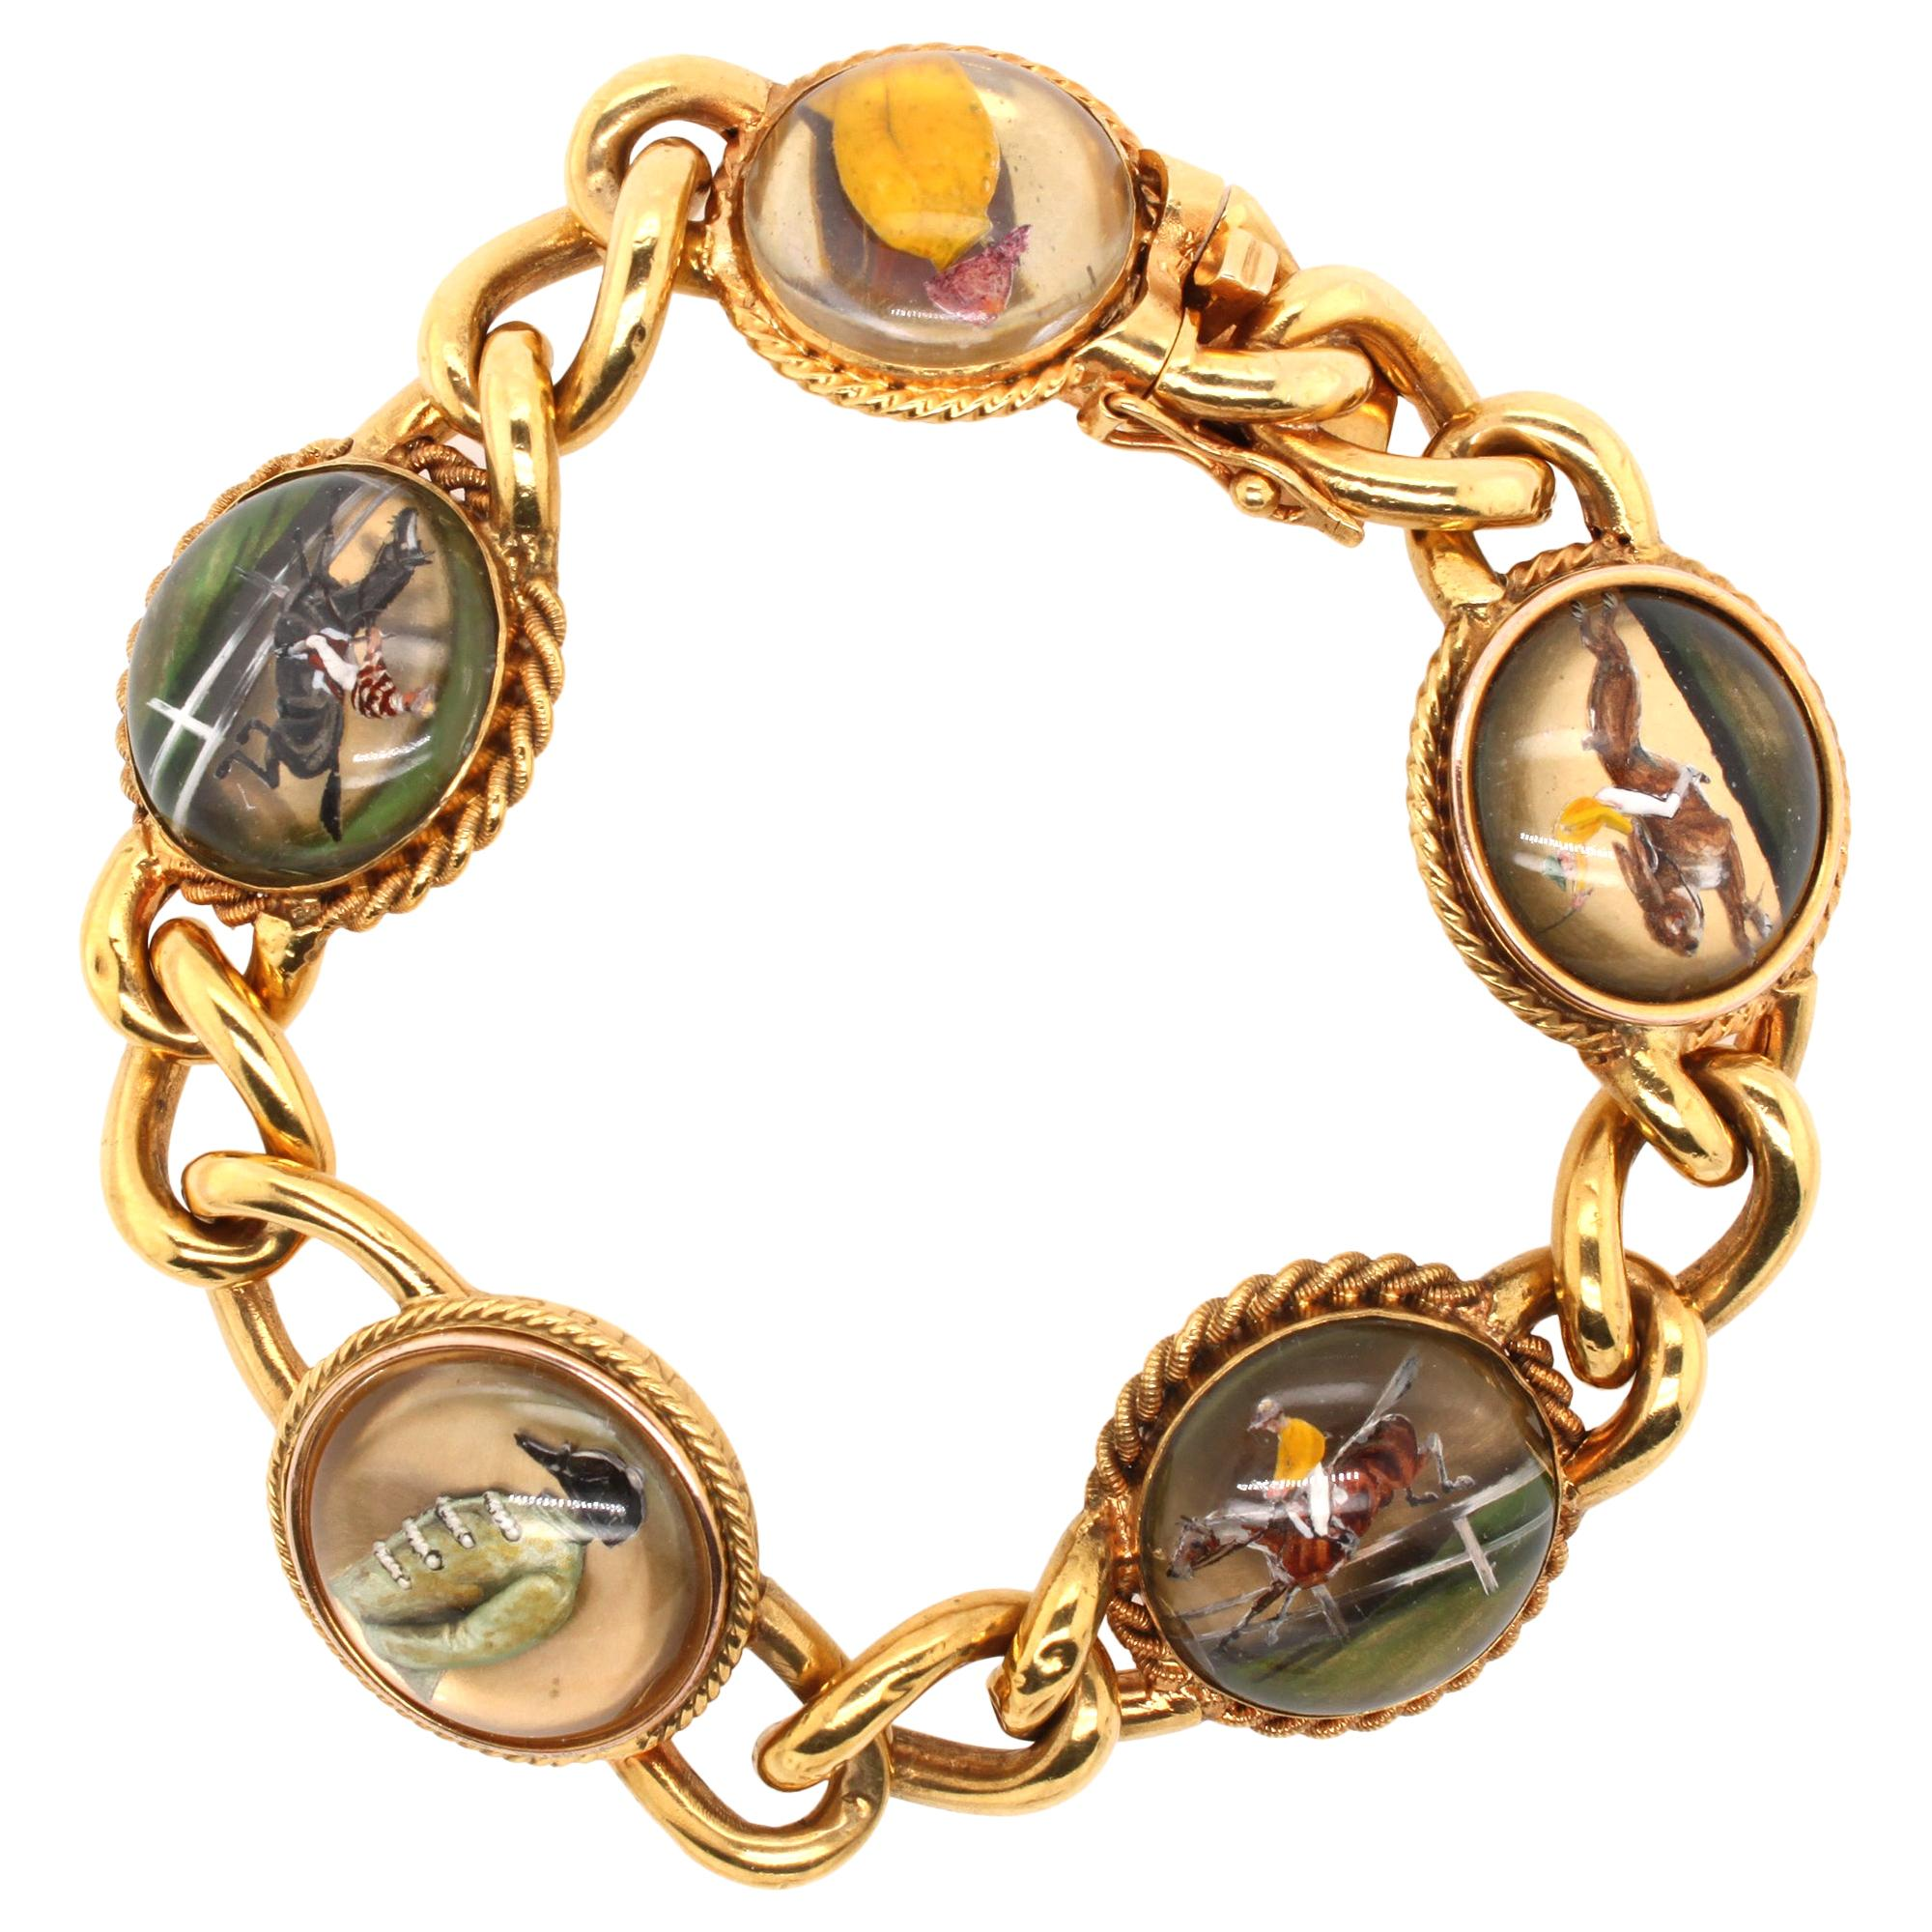 Victorian Jockey Essex Rock Crystal Intaglio Bracelet, circa 1895